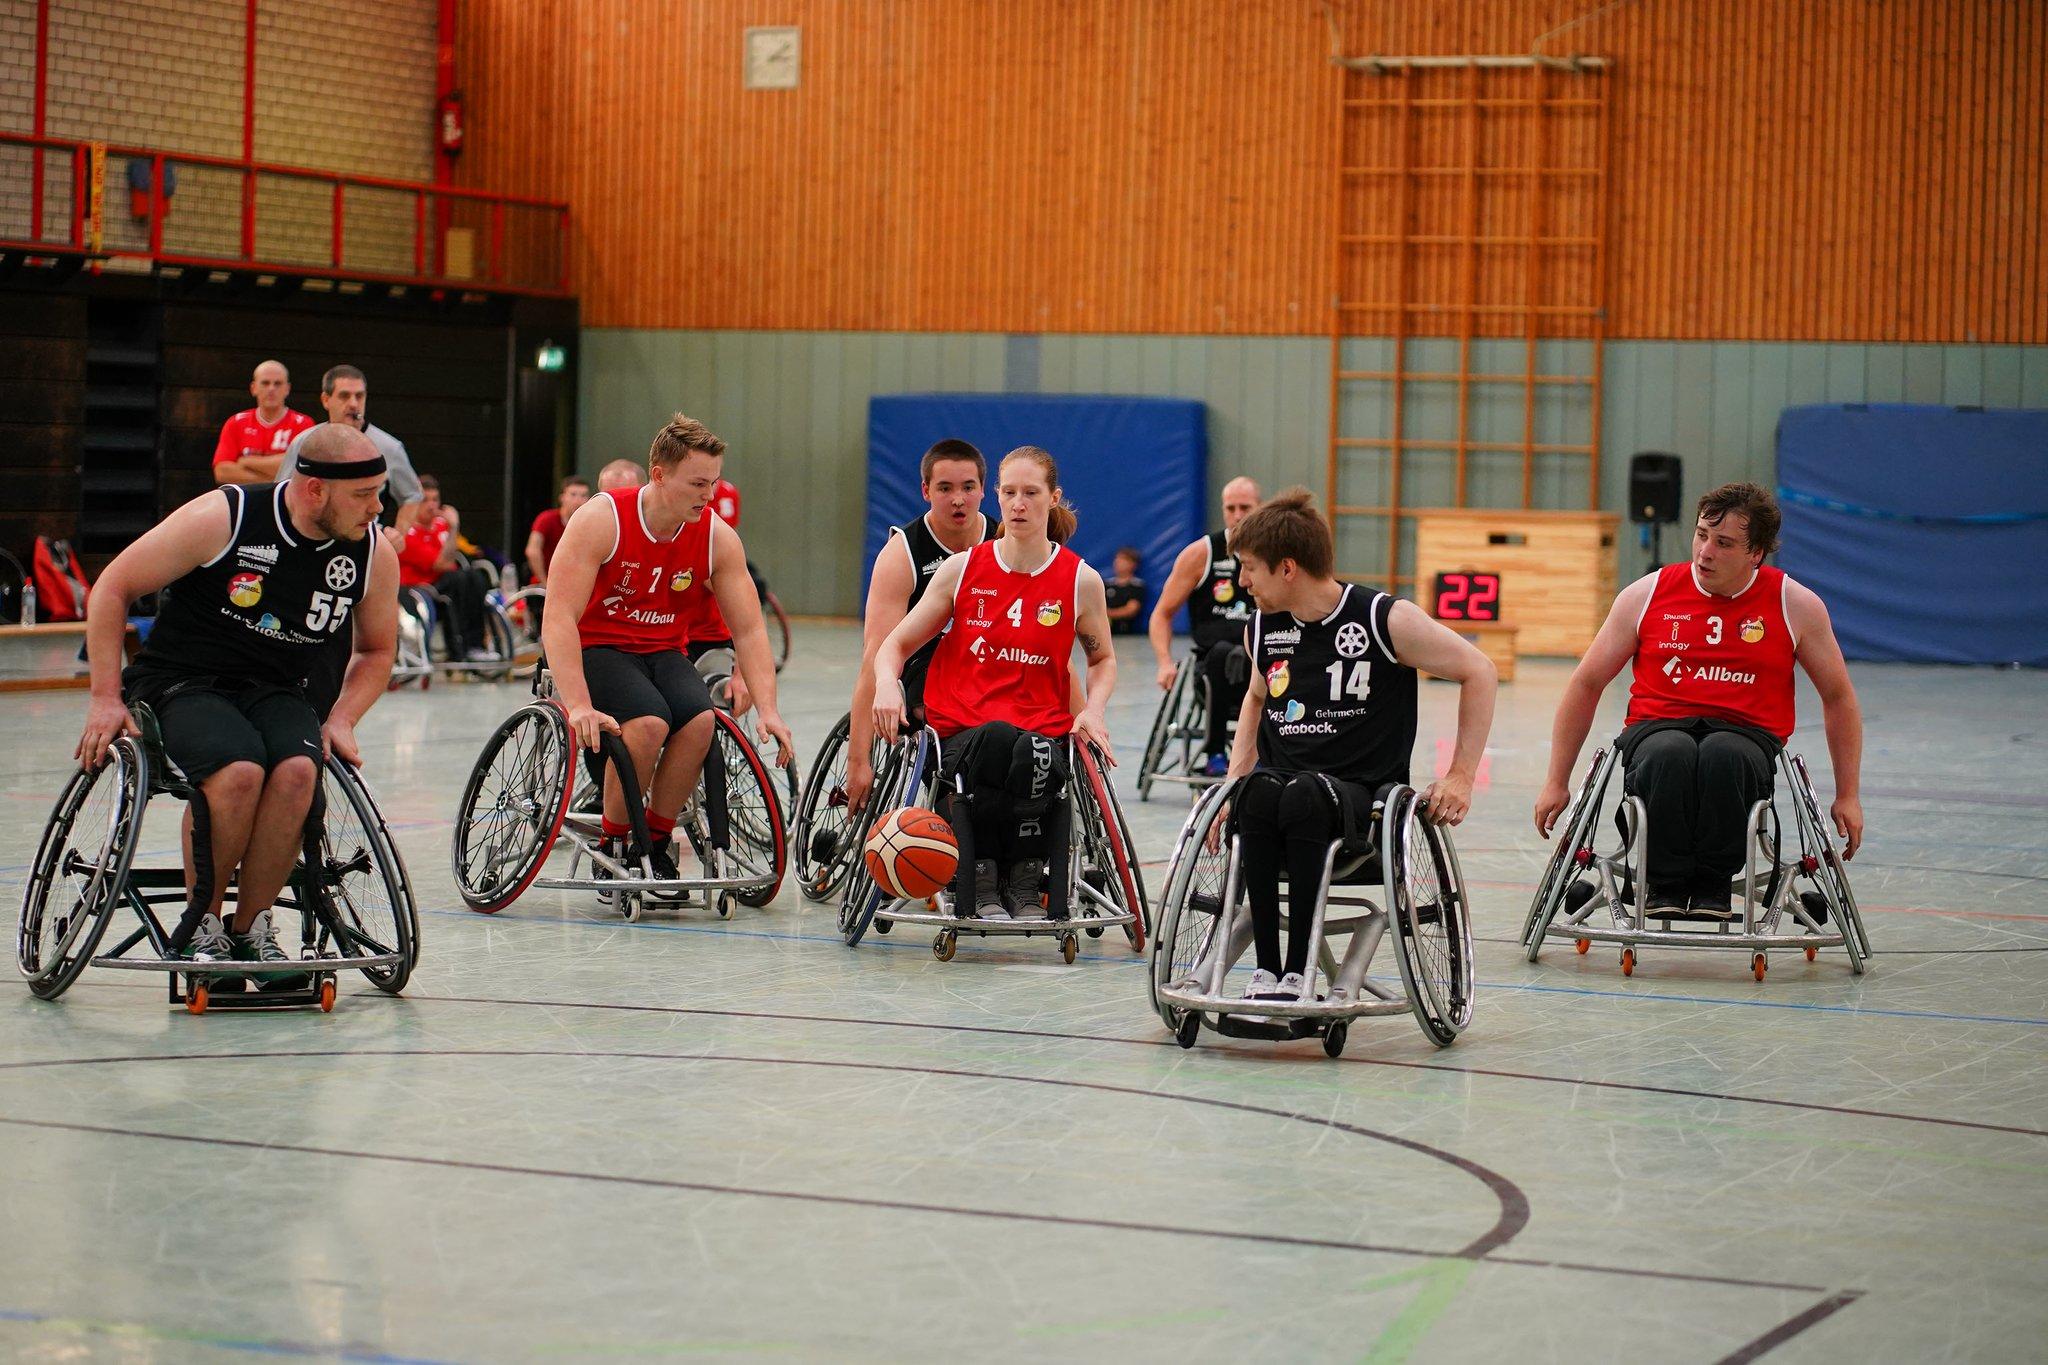 Rollstuhlbasketball Wm Spielplan